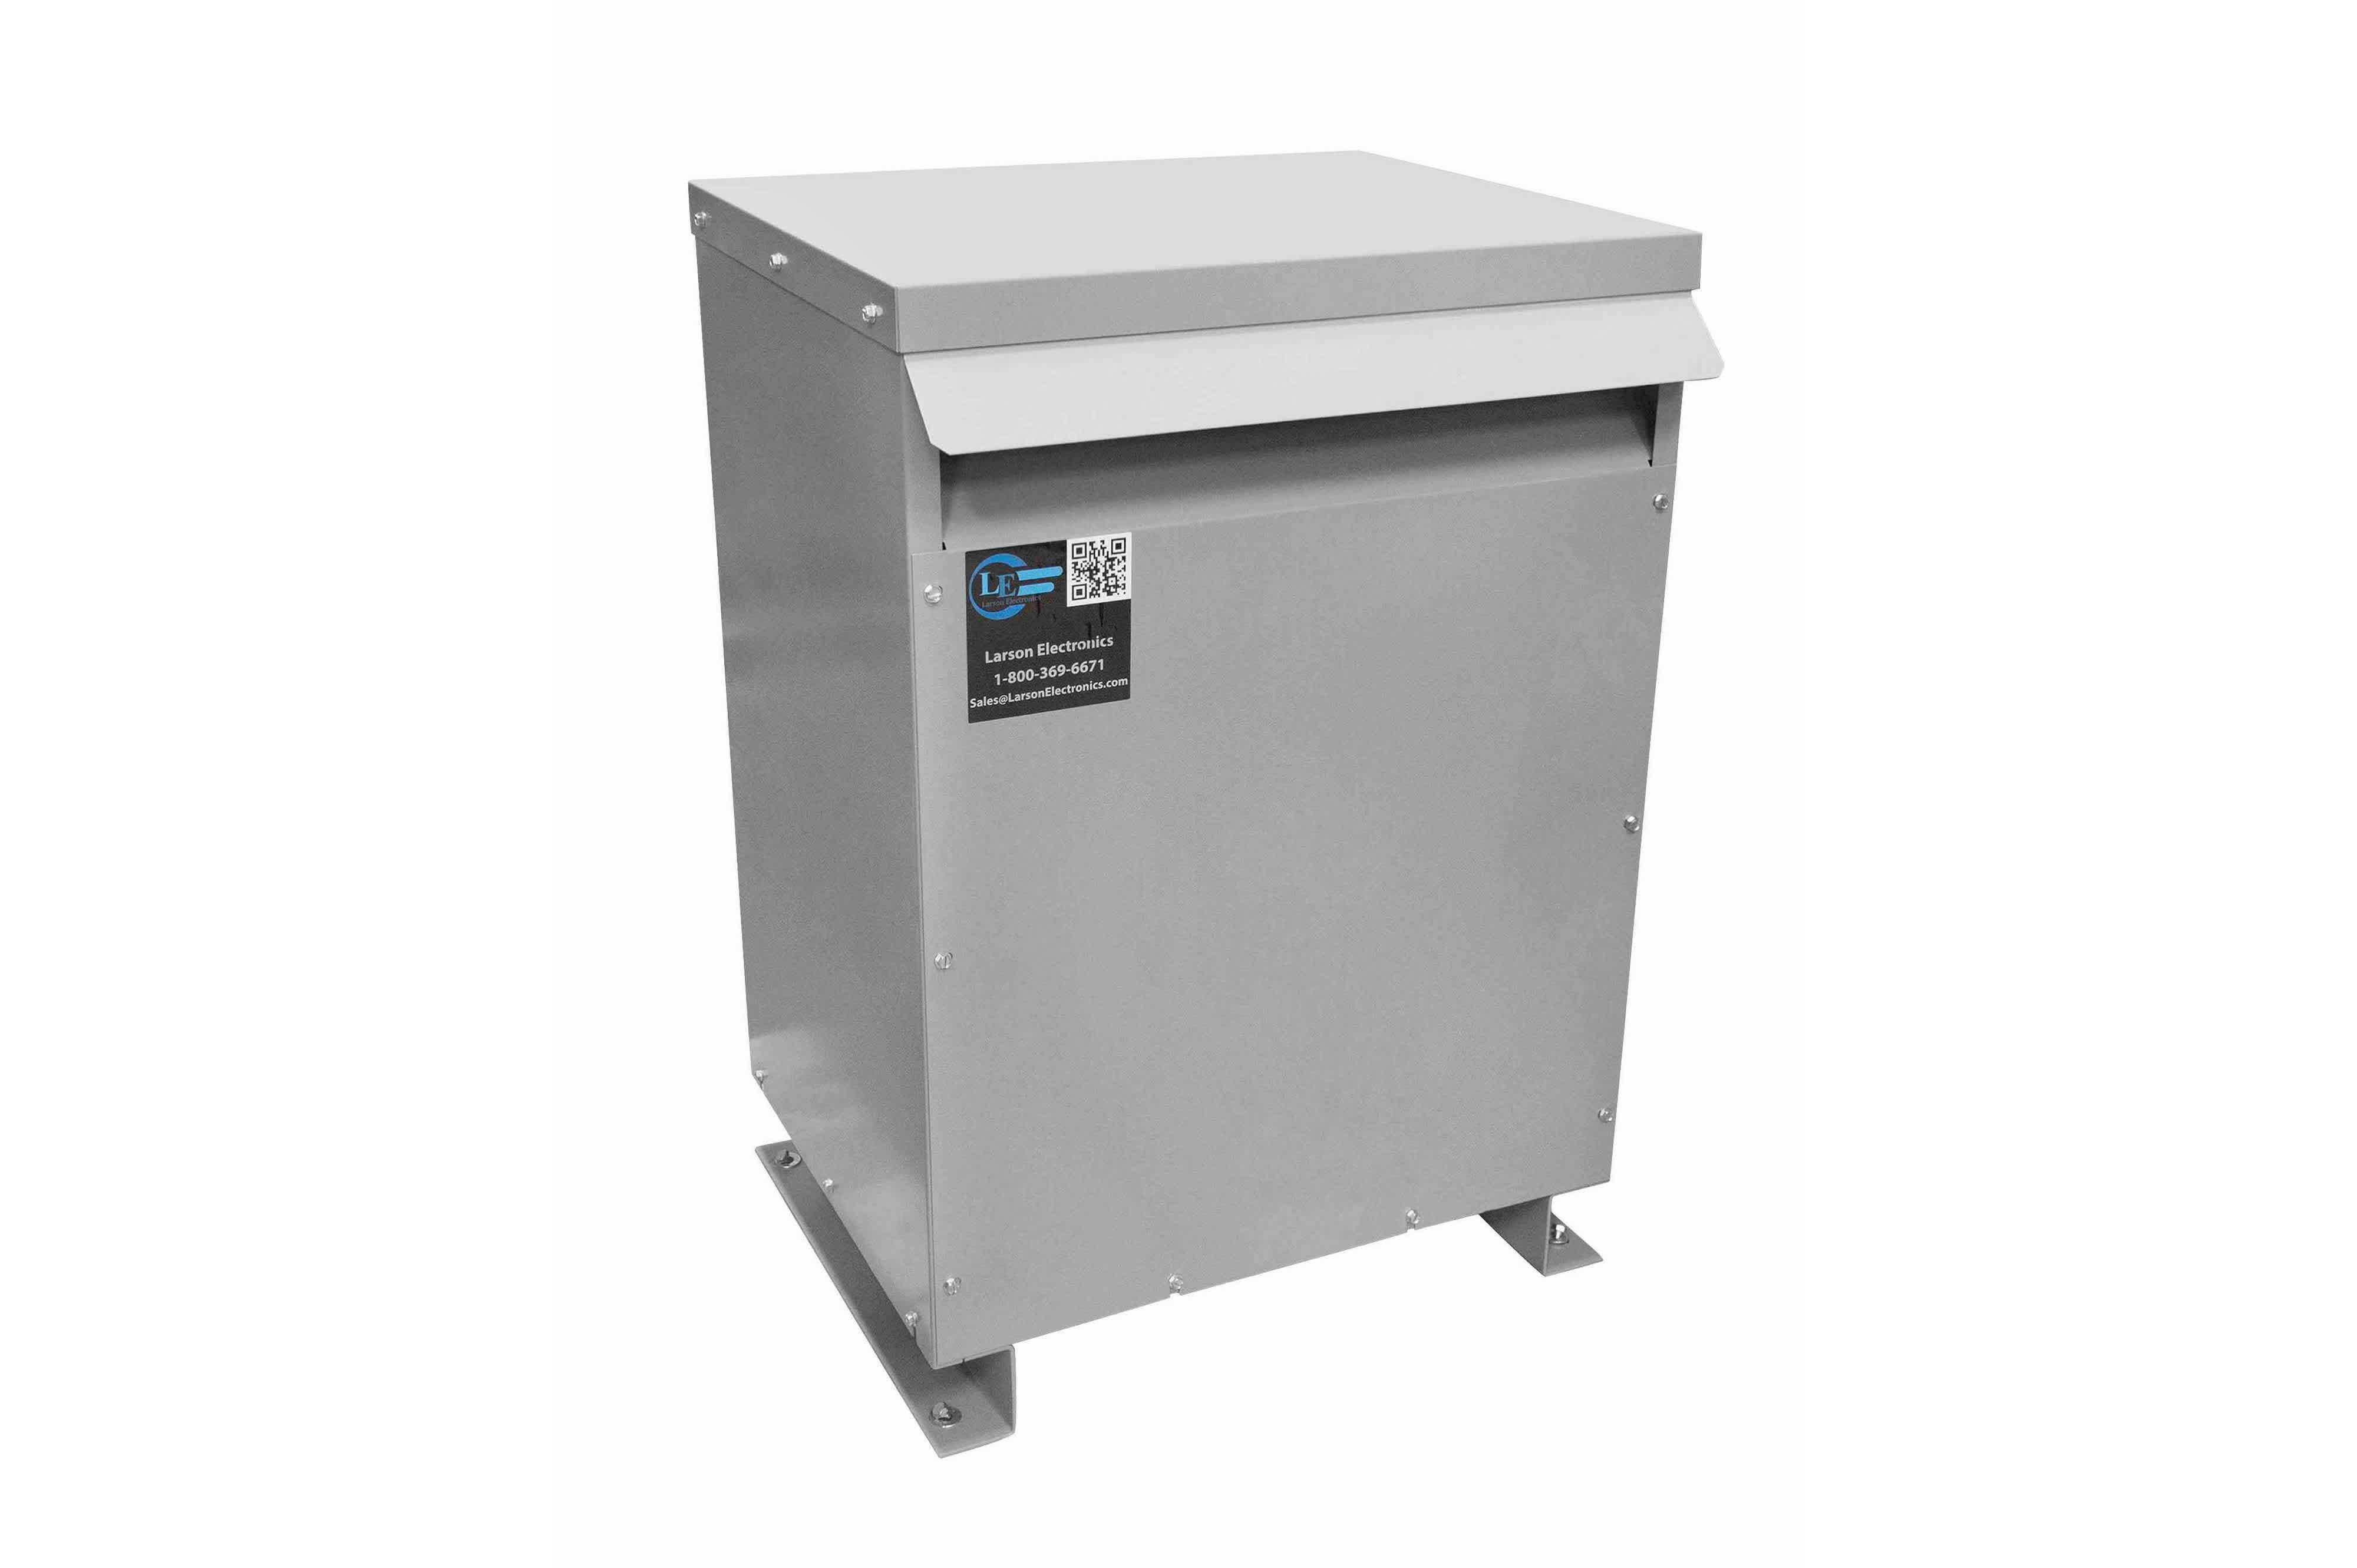 600 kVA 3PH Isolation Transformer, 575V Wye Primary, 380Y/220 Wye-N Secondary, N3R, Ventilated, 60 Hz